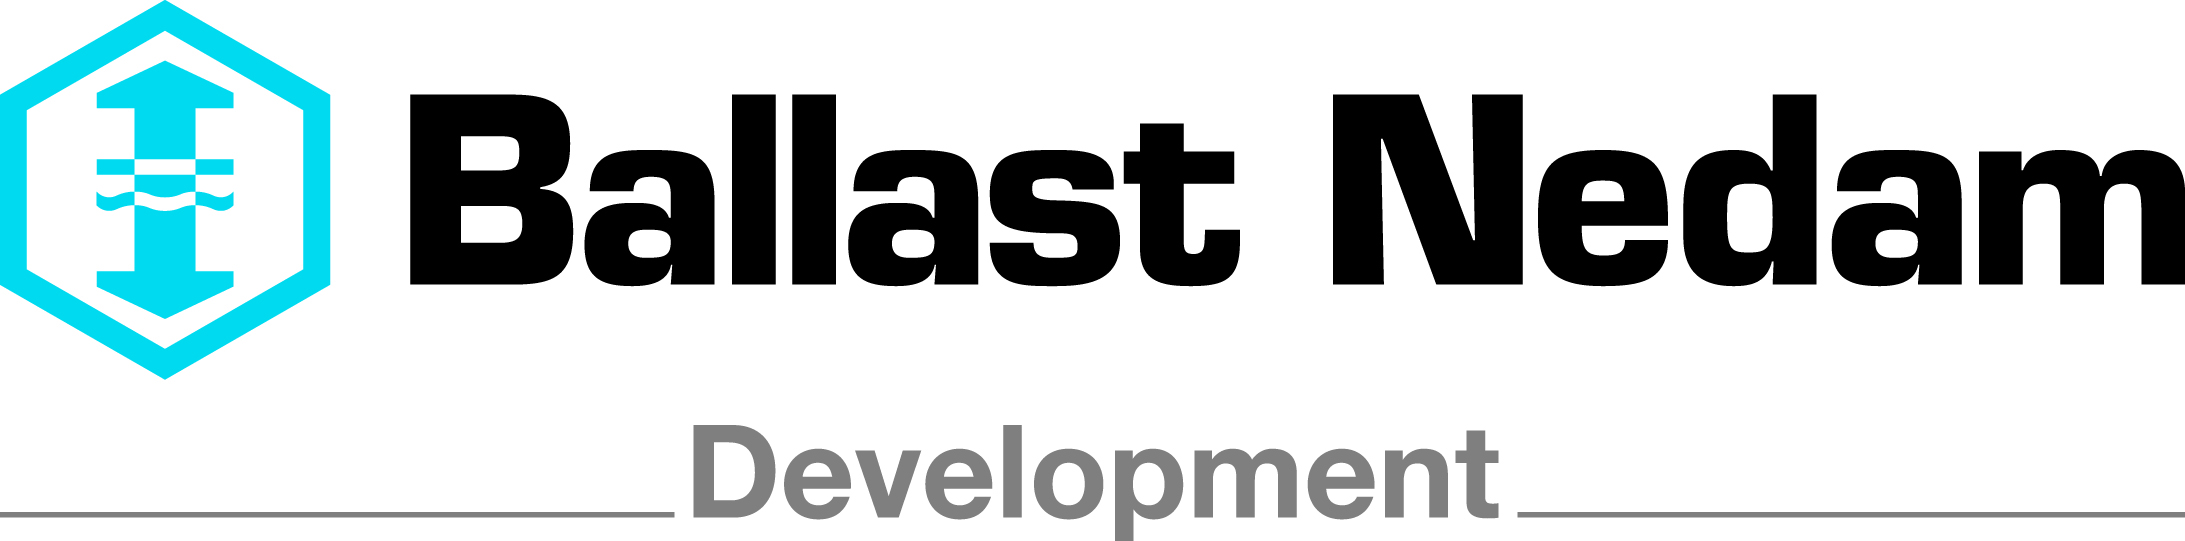 Ballast Nedam Development